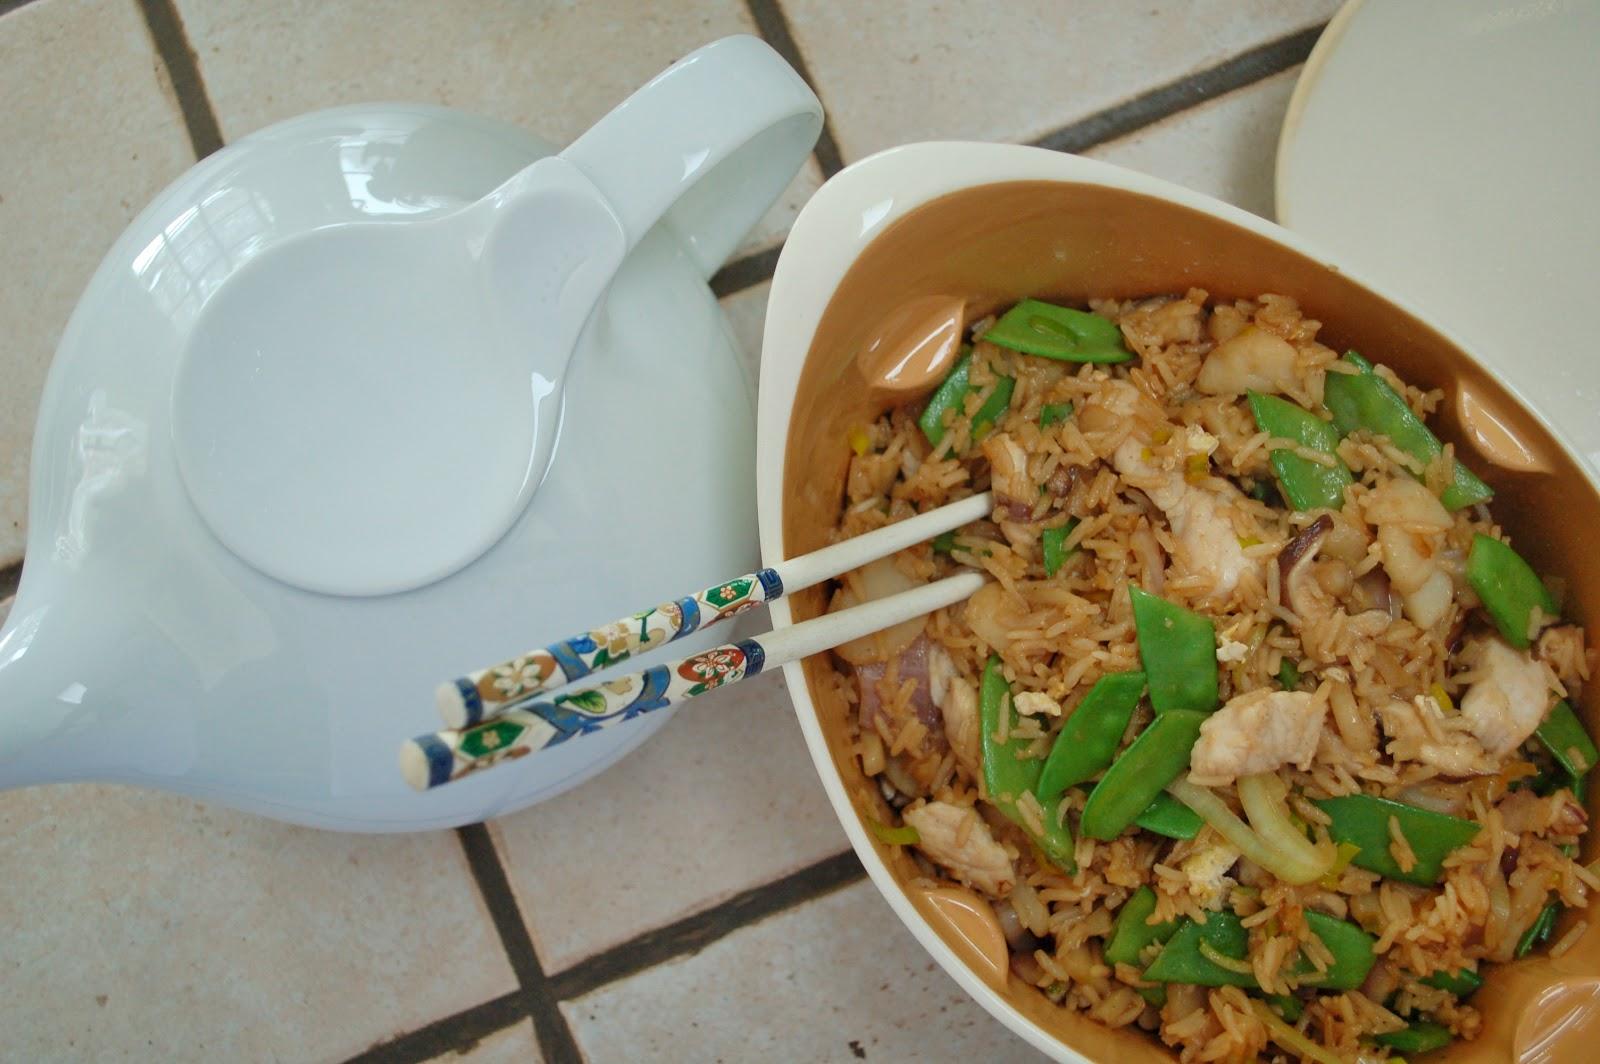 The Spice Garden: Turkey Fried Rice